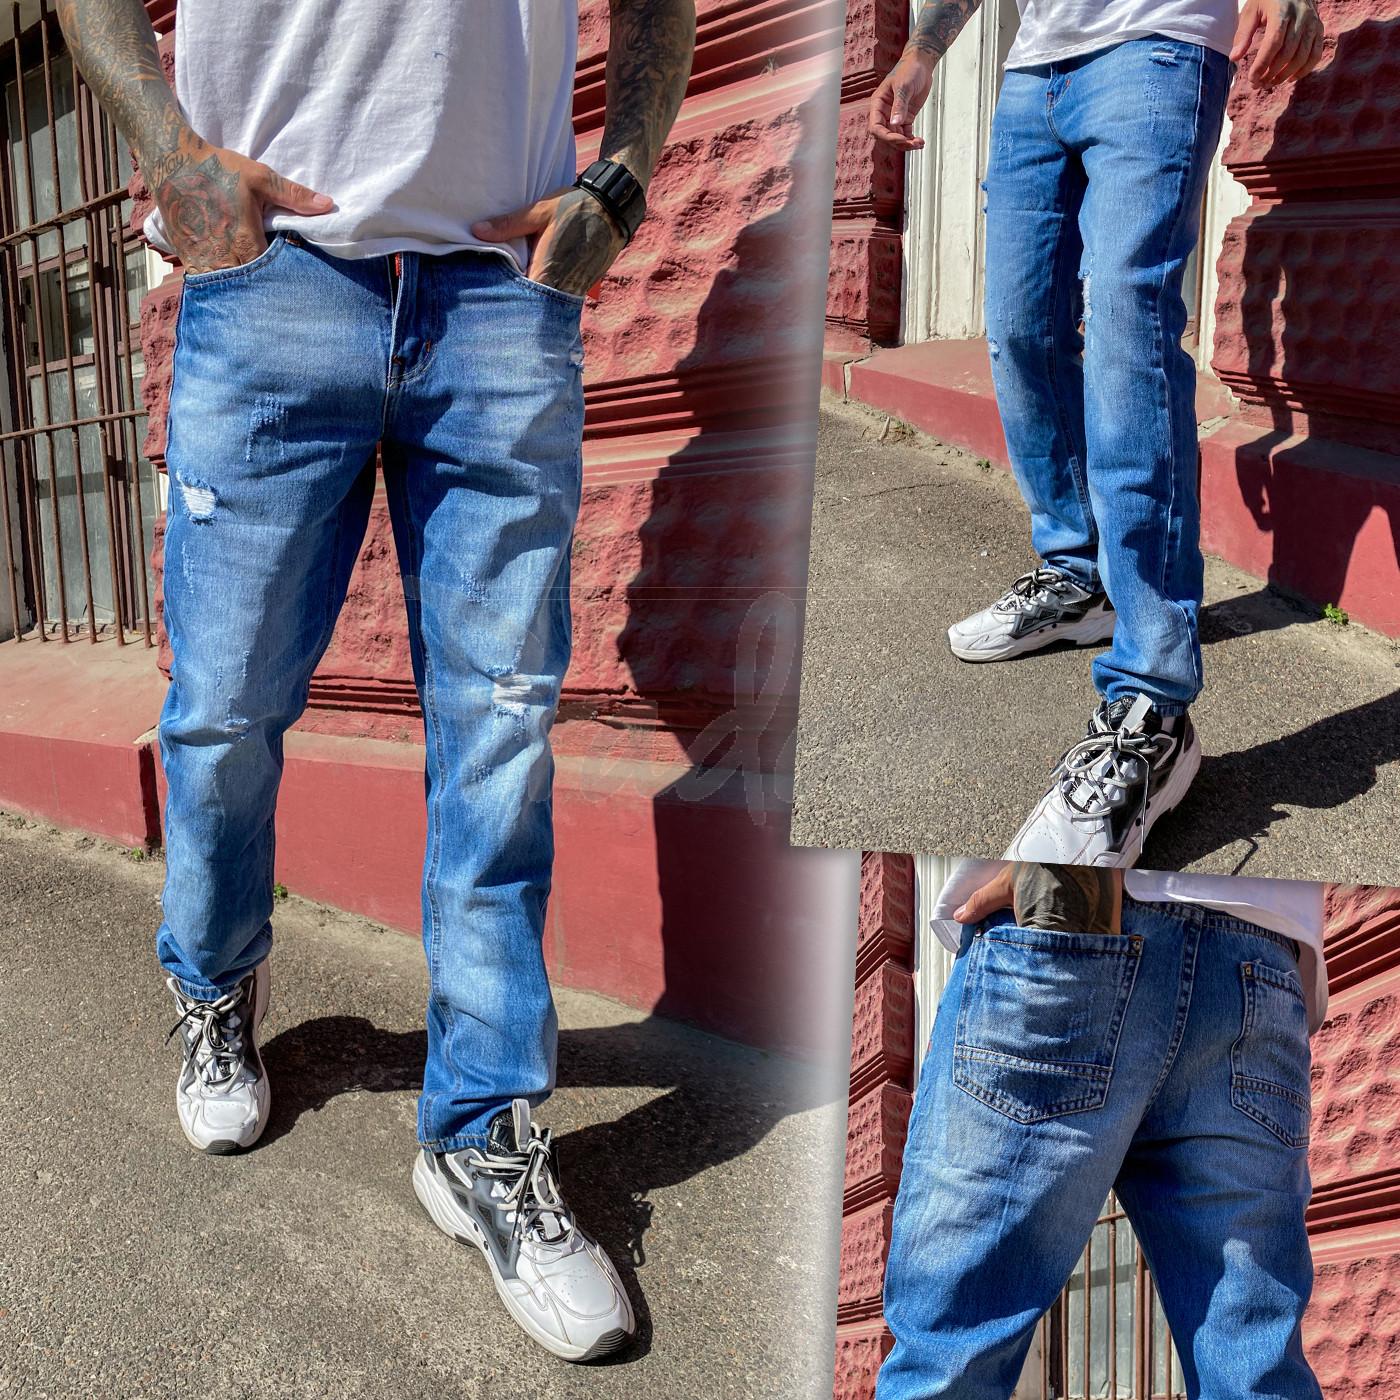 9901-3 Relucky джинсы мужские голубые стрейчевые (8 ед. размеры: 29.30.31.32.33.34.36.38)